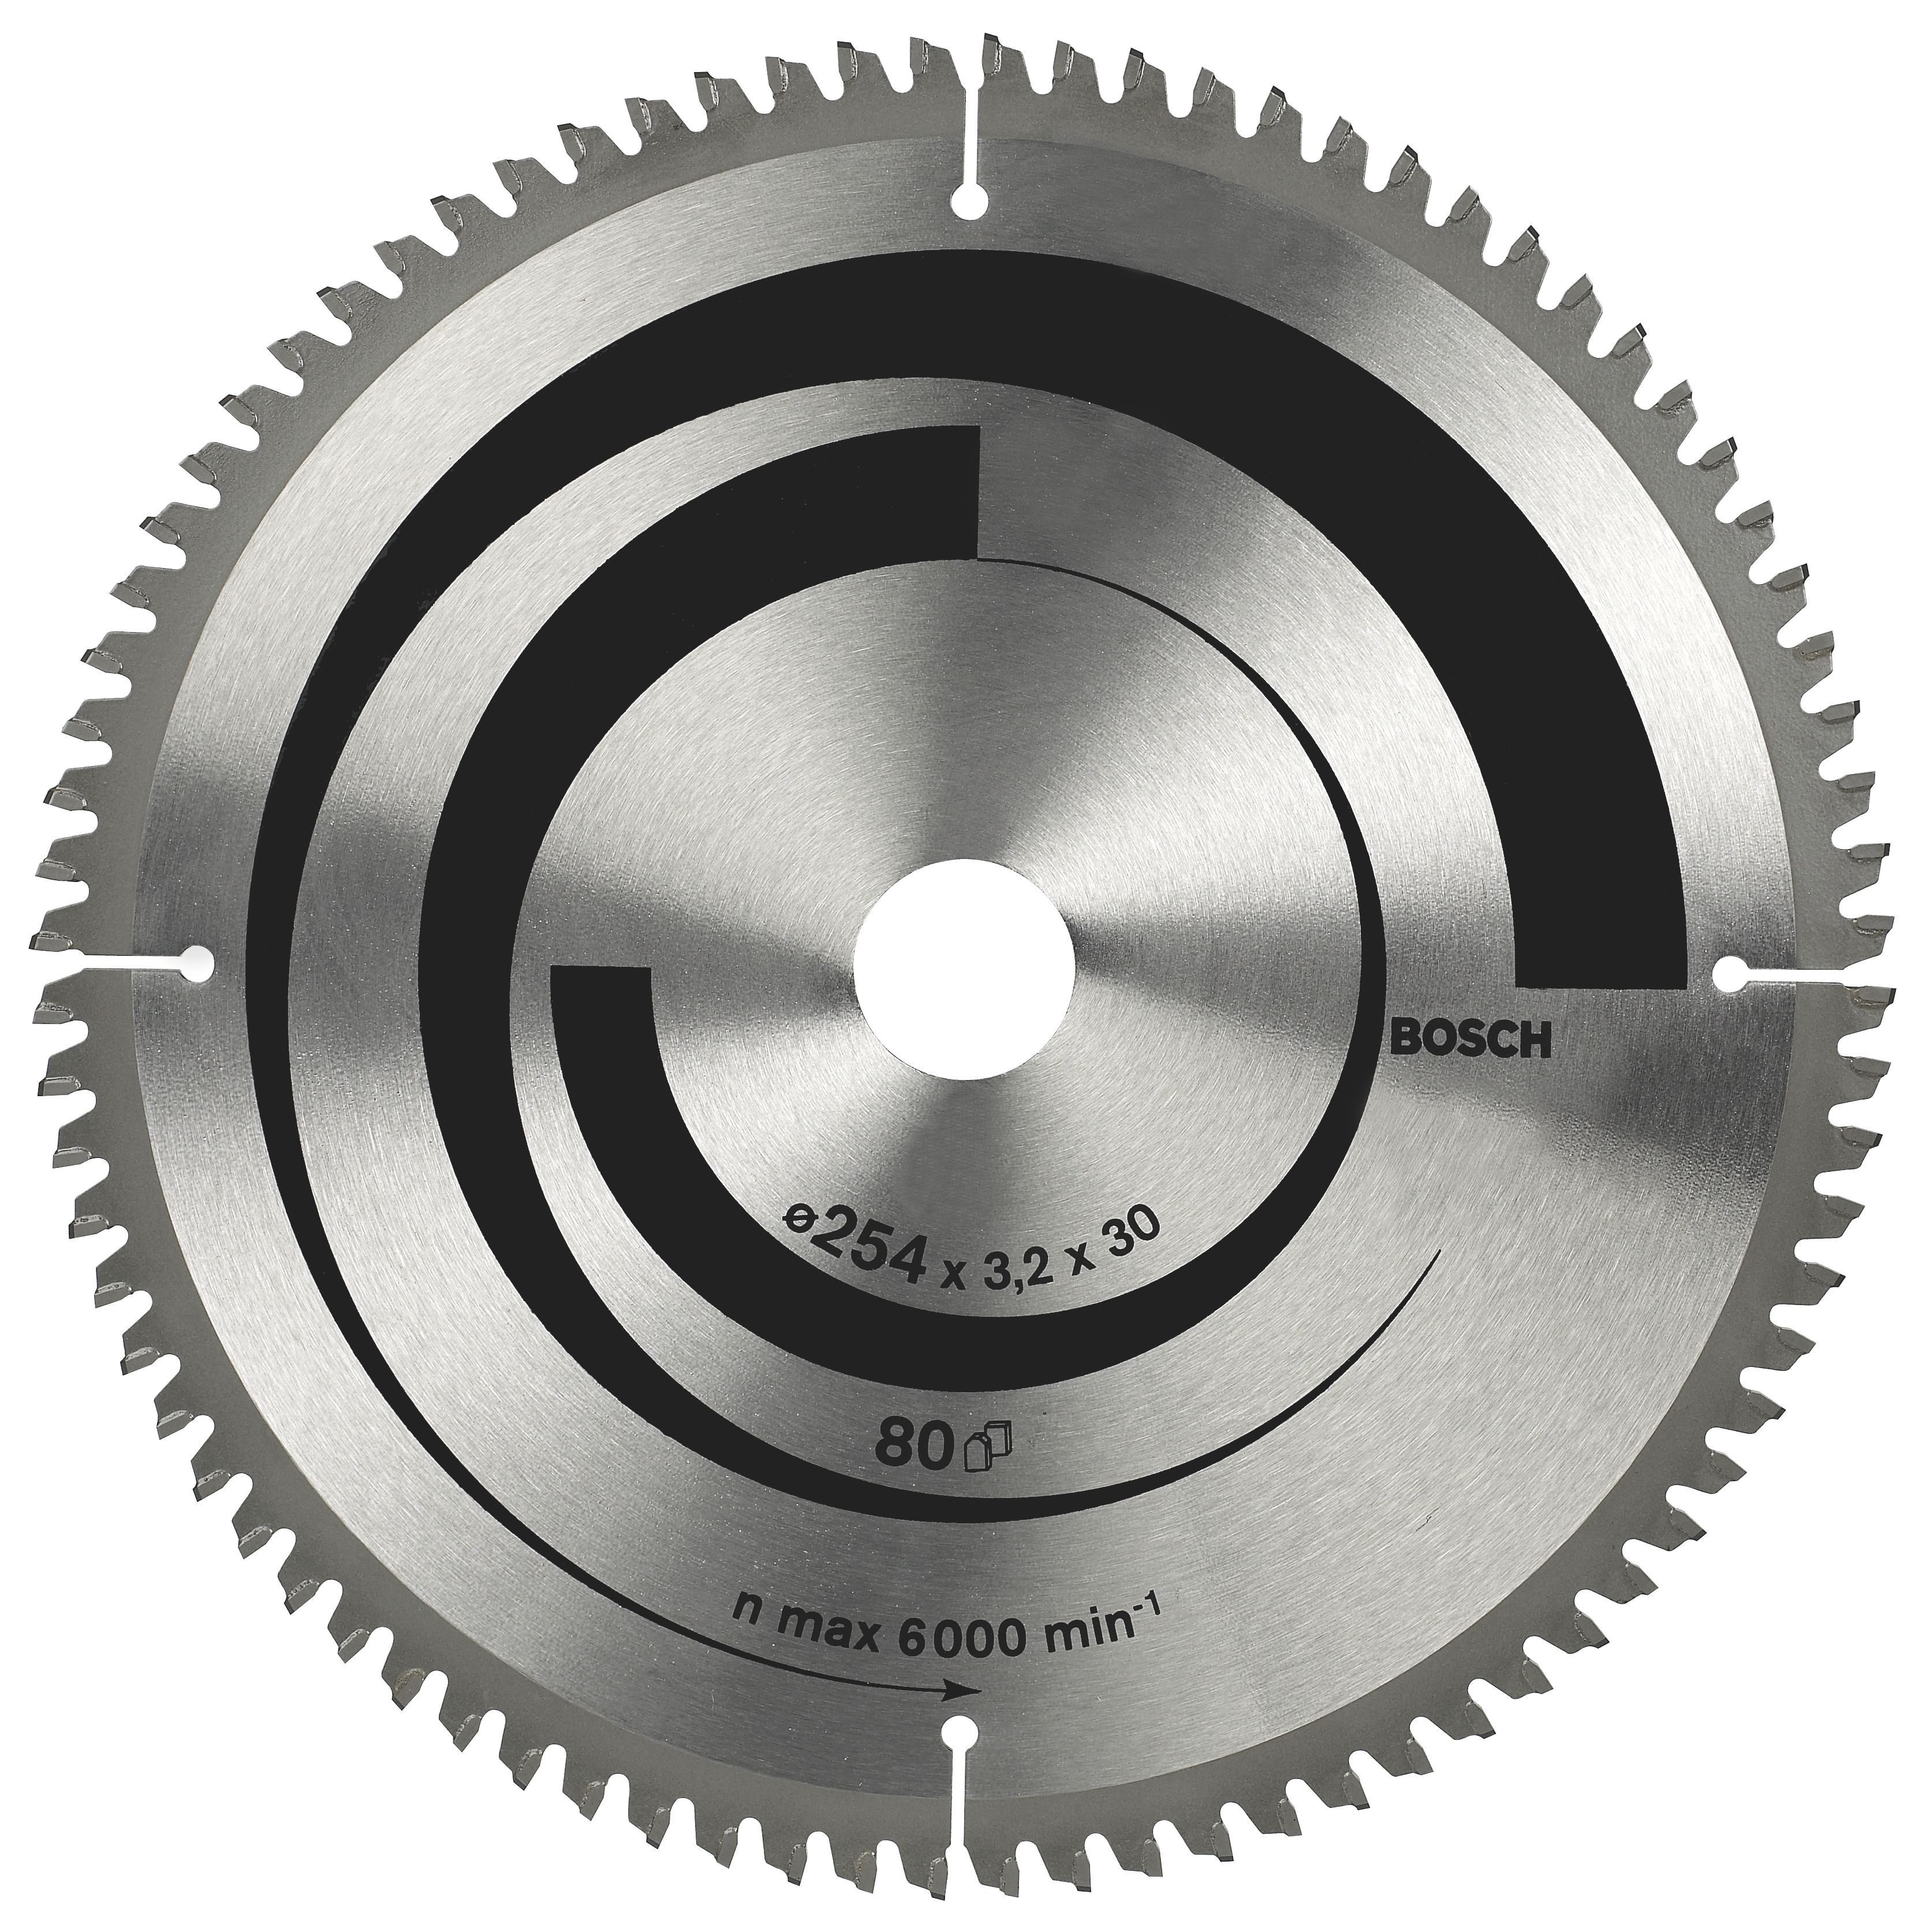 Bosch 80t Circular Saw Blade (dia)254mm